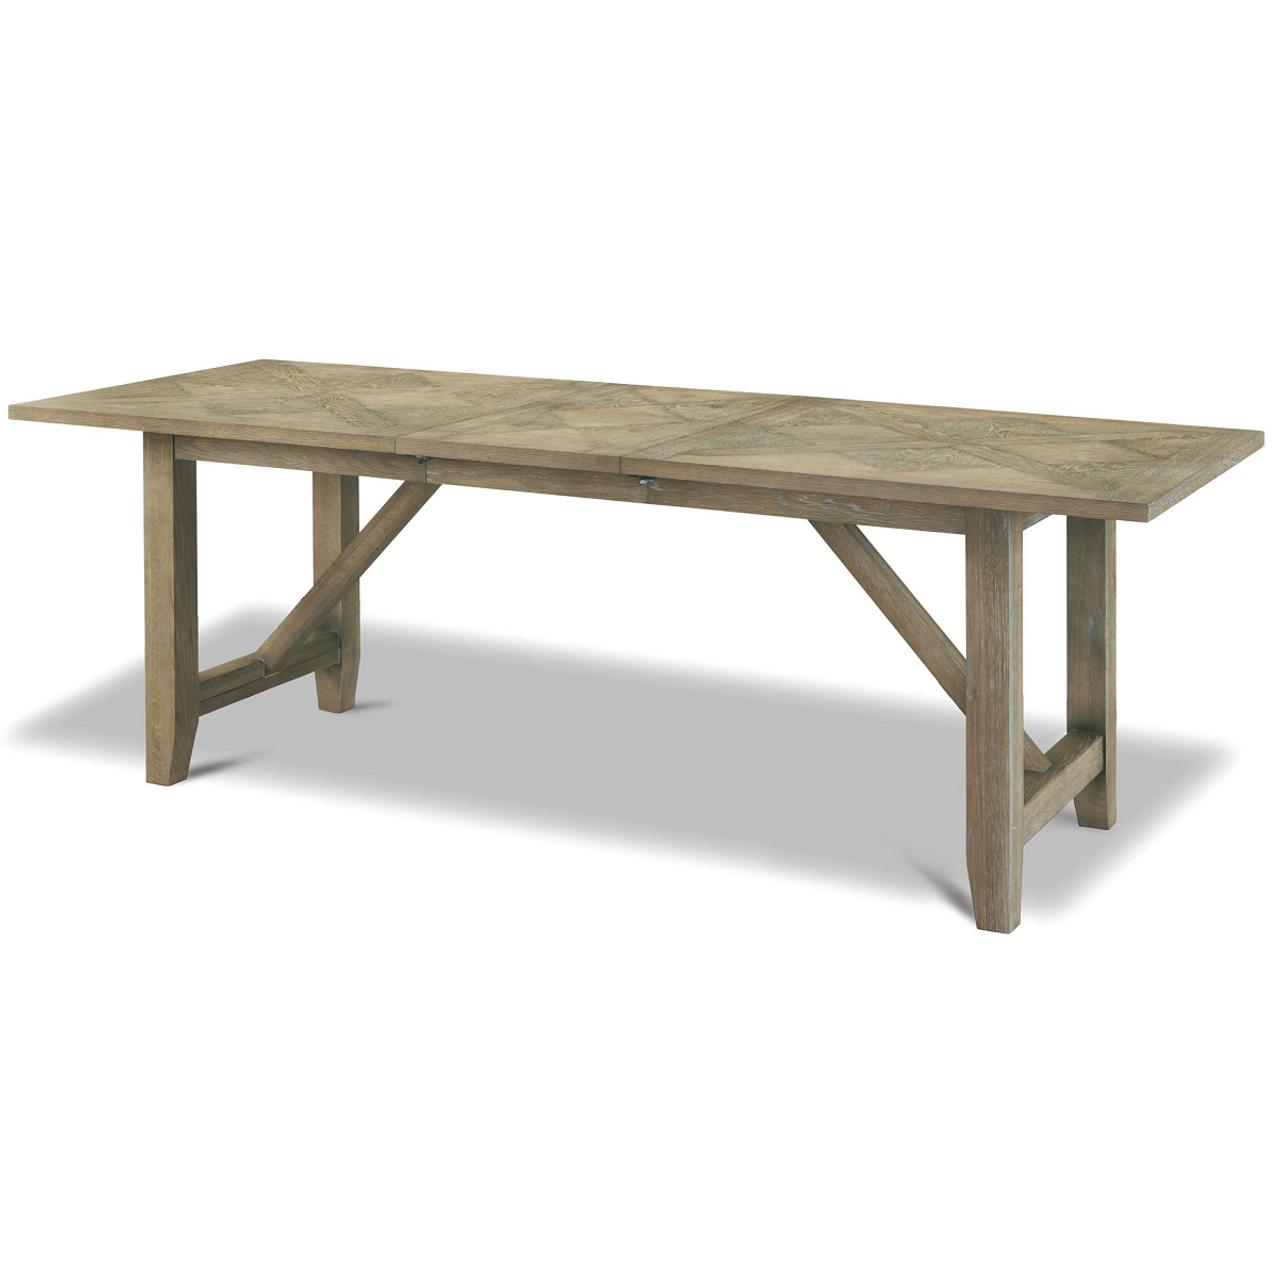 French Oak Extendable Farmhouse Kitchen Table 78-100\